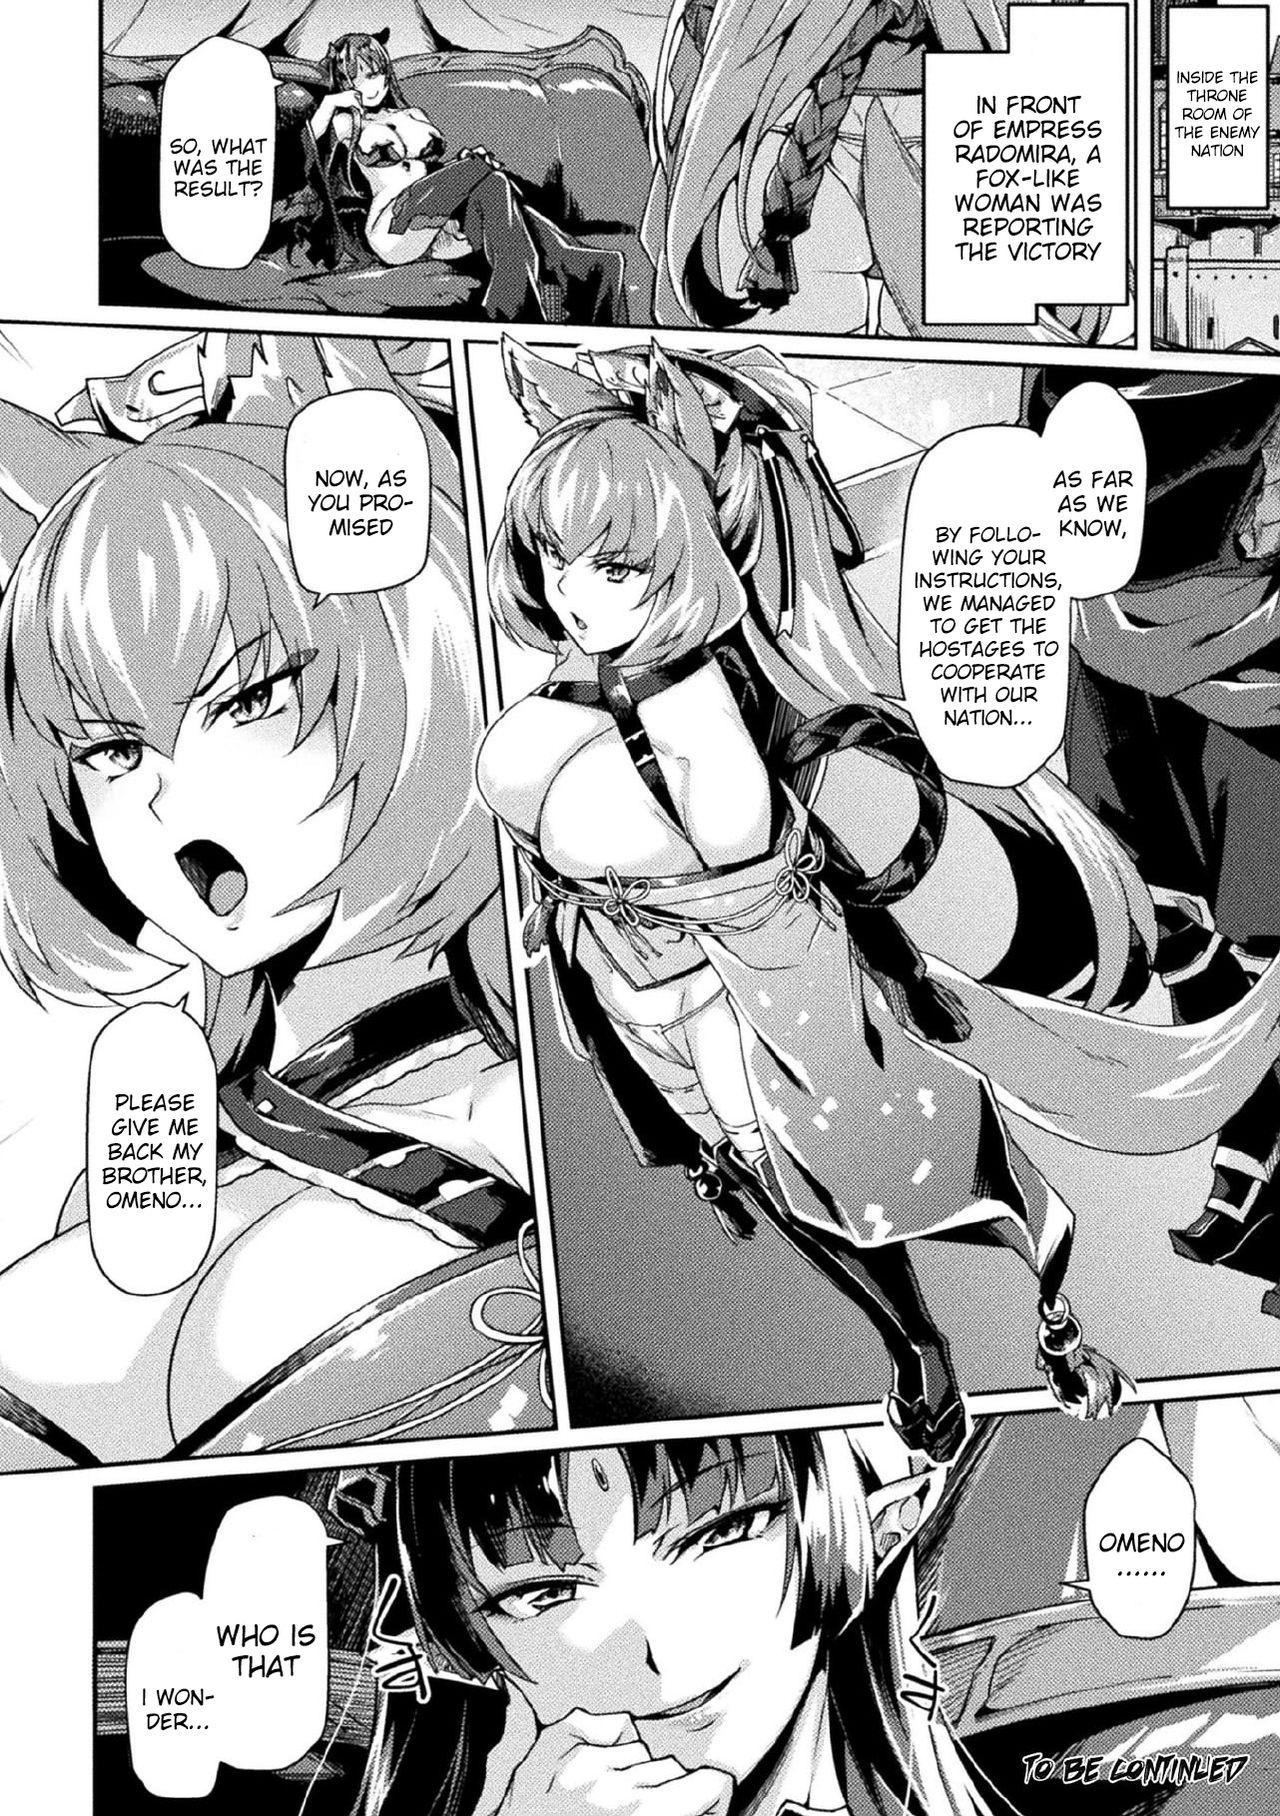 [Tsukitokage] Kuroinu II ~Inyoku ni Somaru Haitoku no Miyako, Futatabi~ THE COMIC Ch. 4 (Kukkoro Heroines Vol. 3) [English] [Klub Kemoner, Raknnkarscans] [Decensored] [Digital] 21